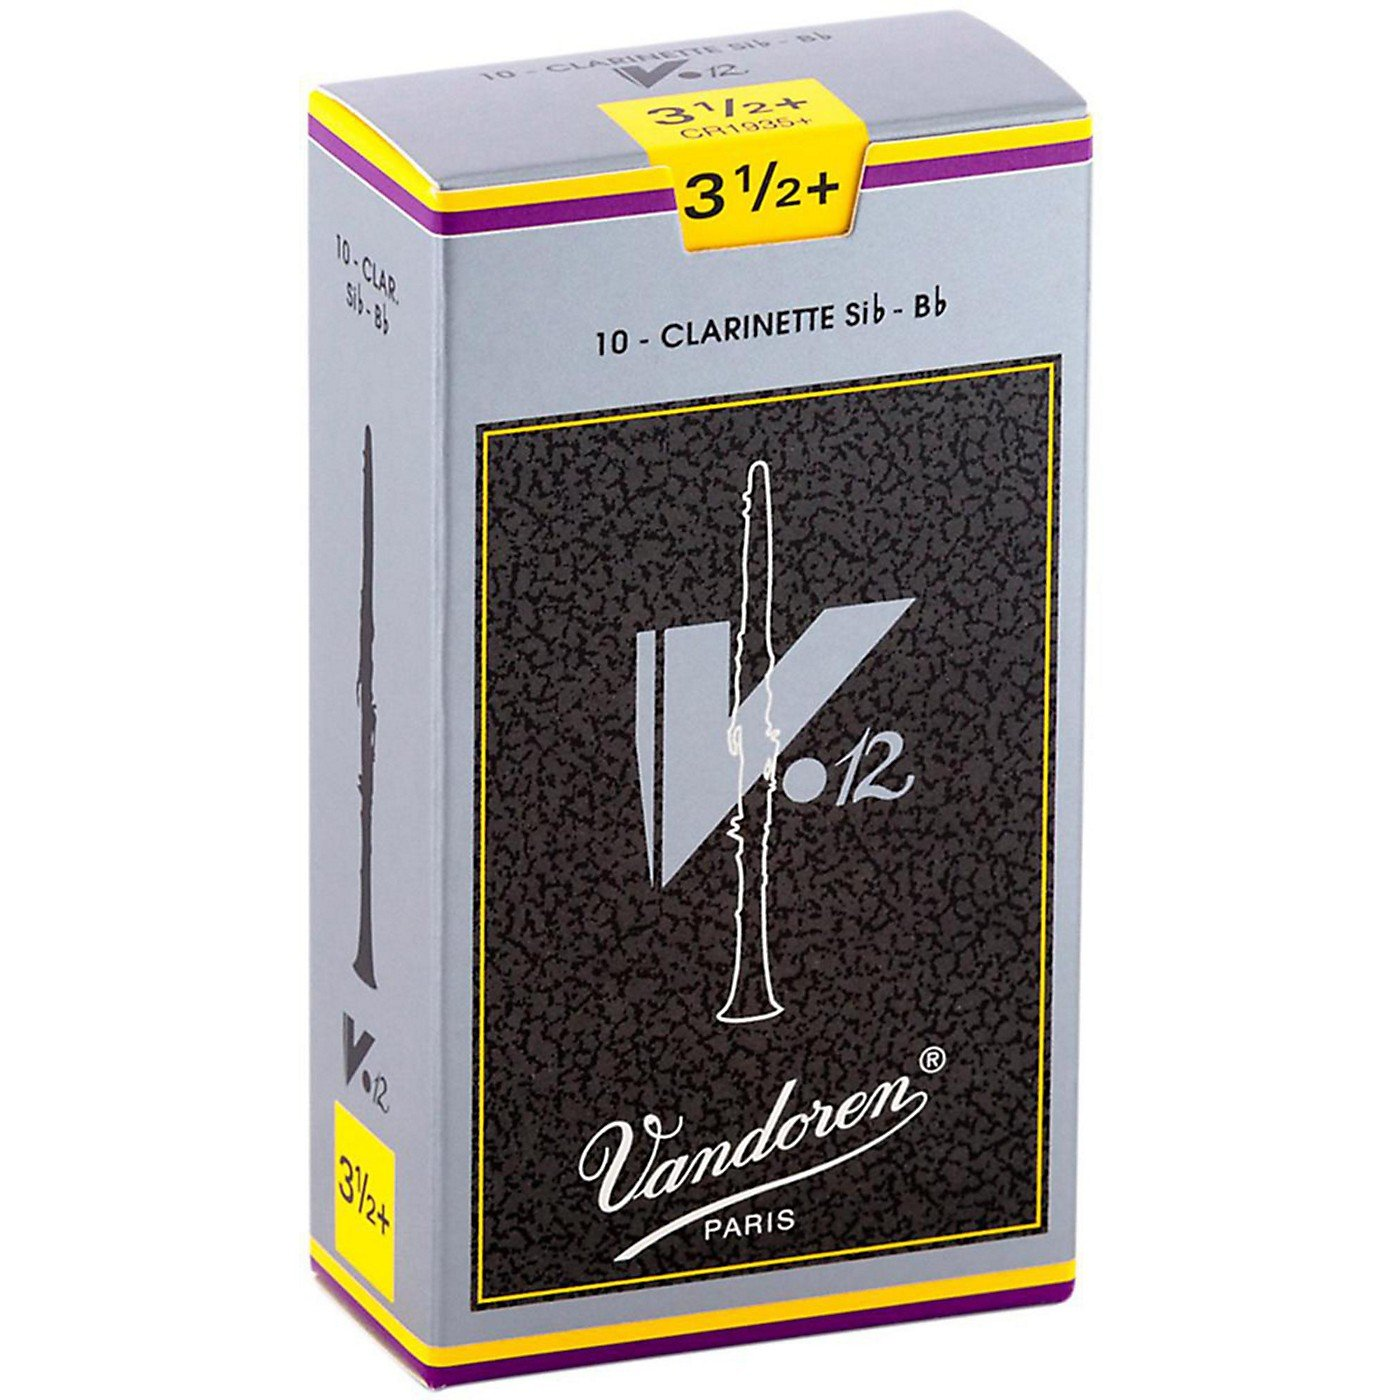 Vandoren V12 Bb Clarinet Reeds Strength Box of 10